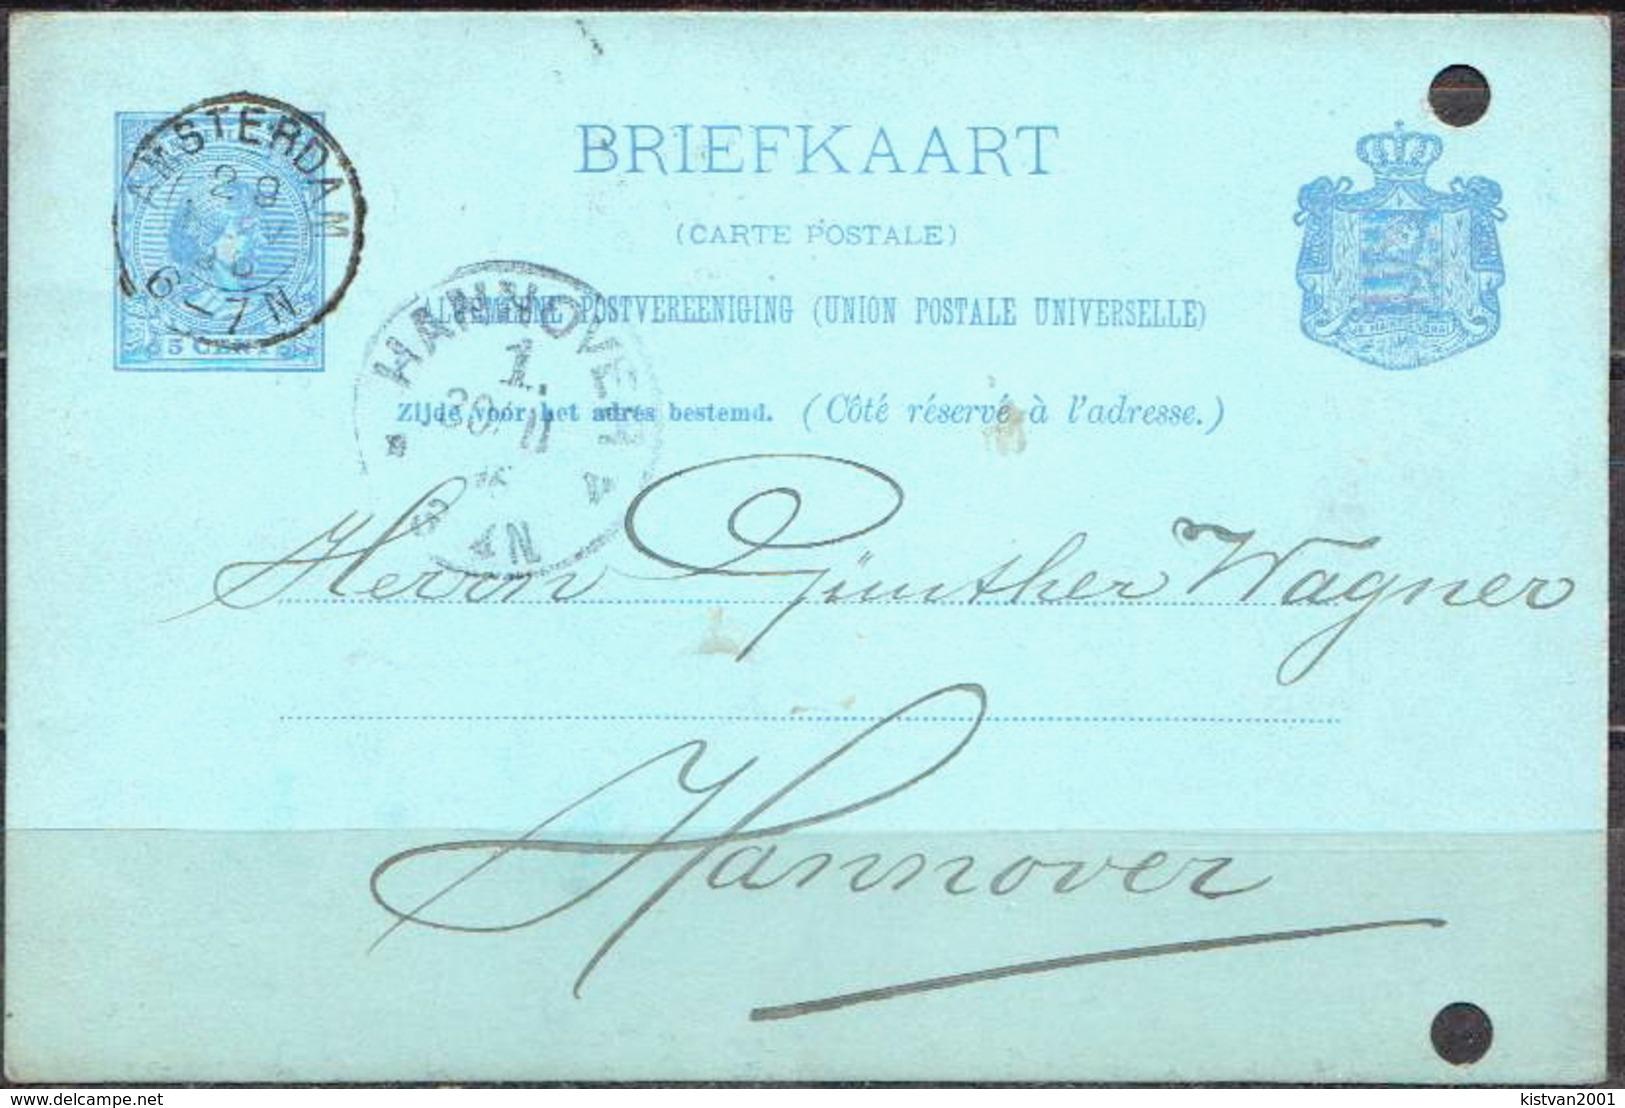 Postal History: Netherlands Postal Stationary From 1896 - Postal Stationery